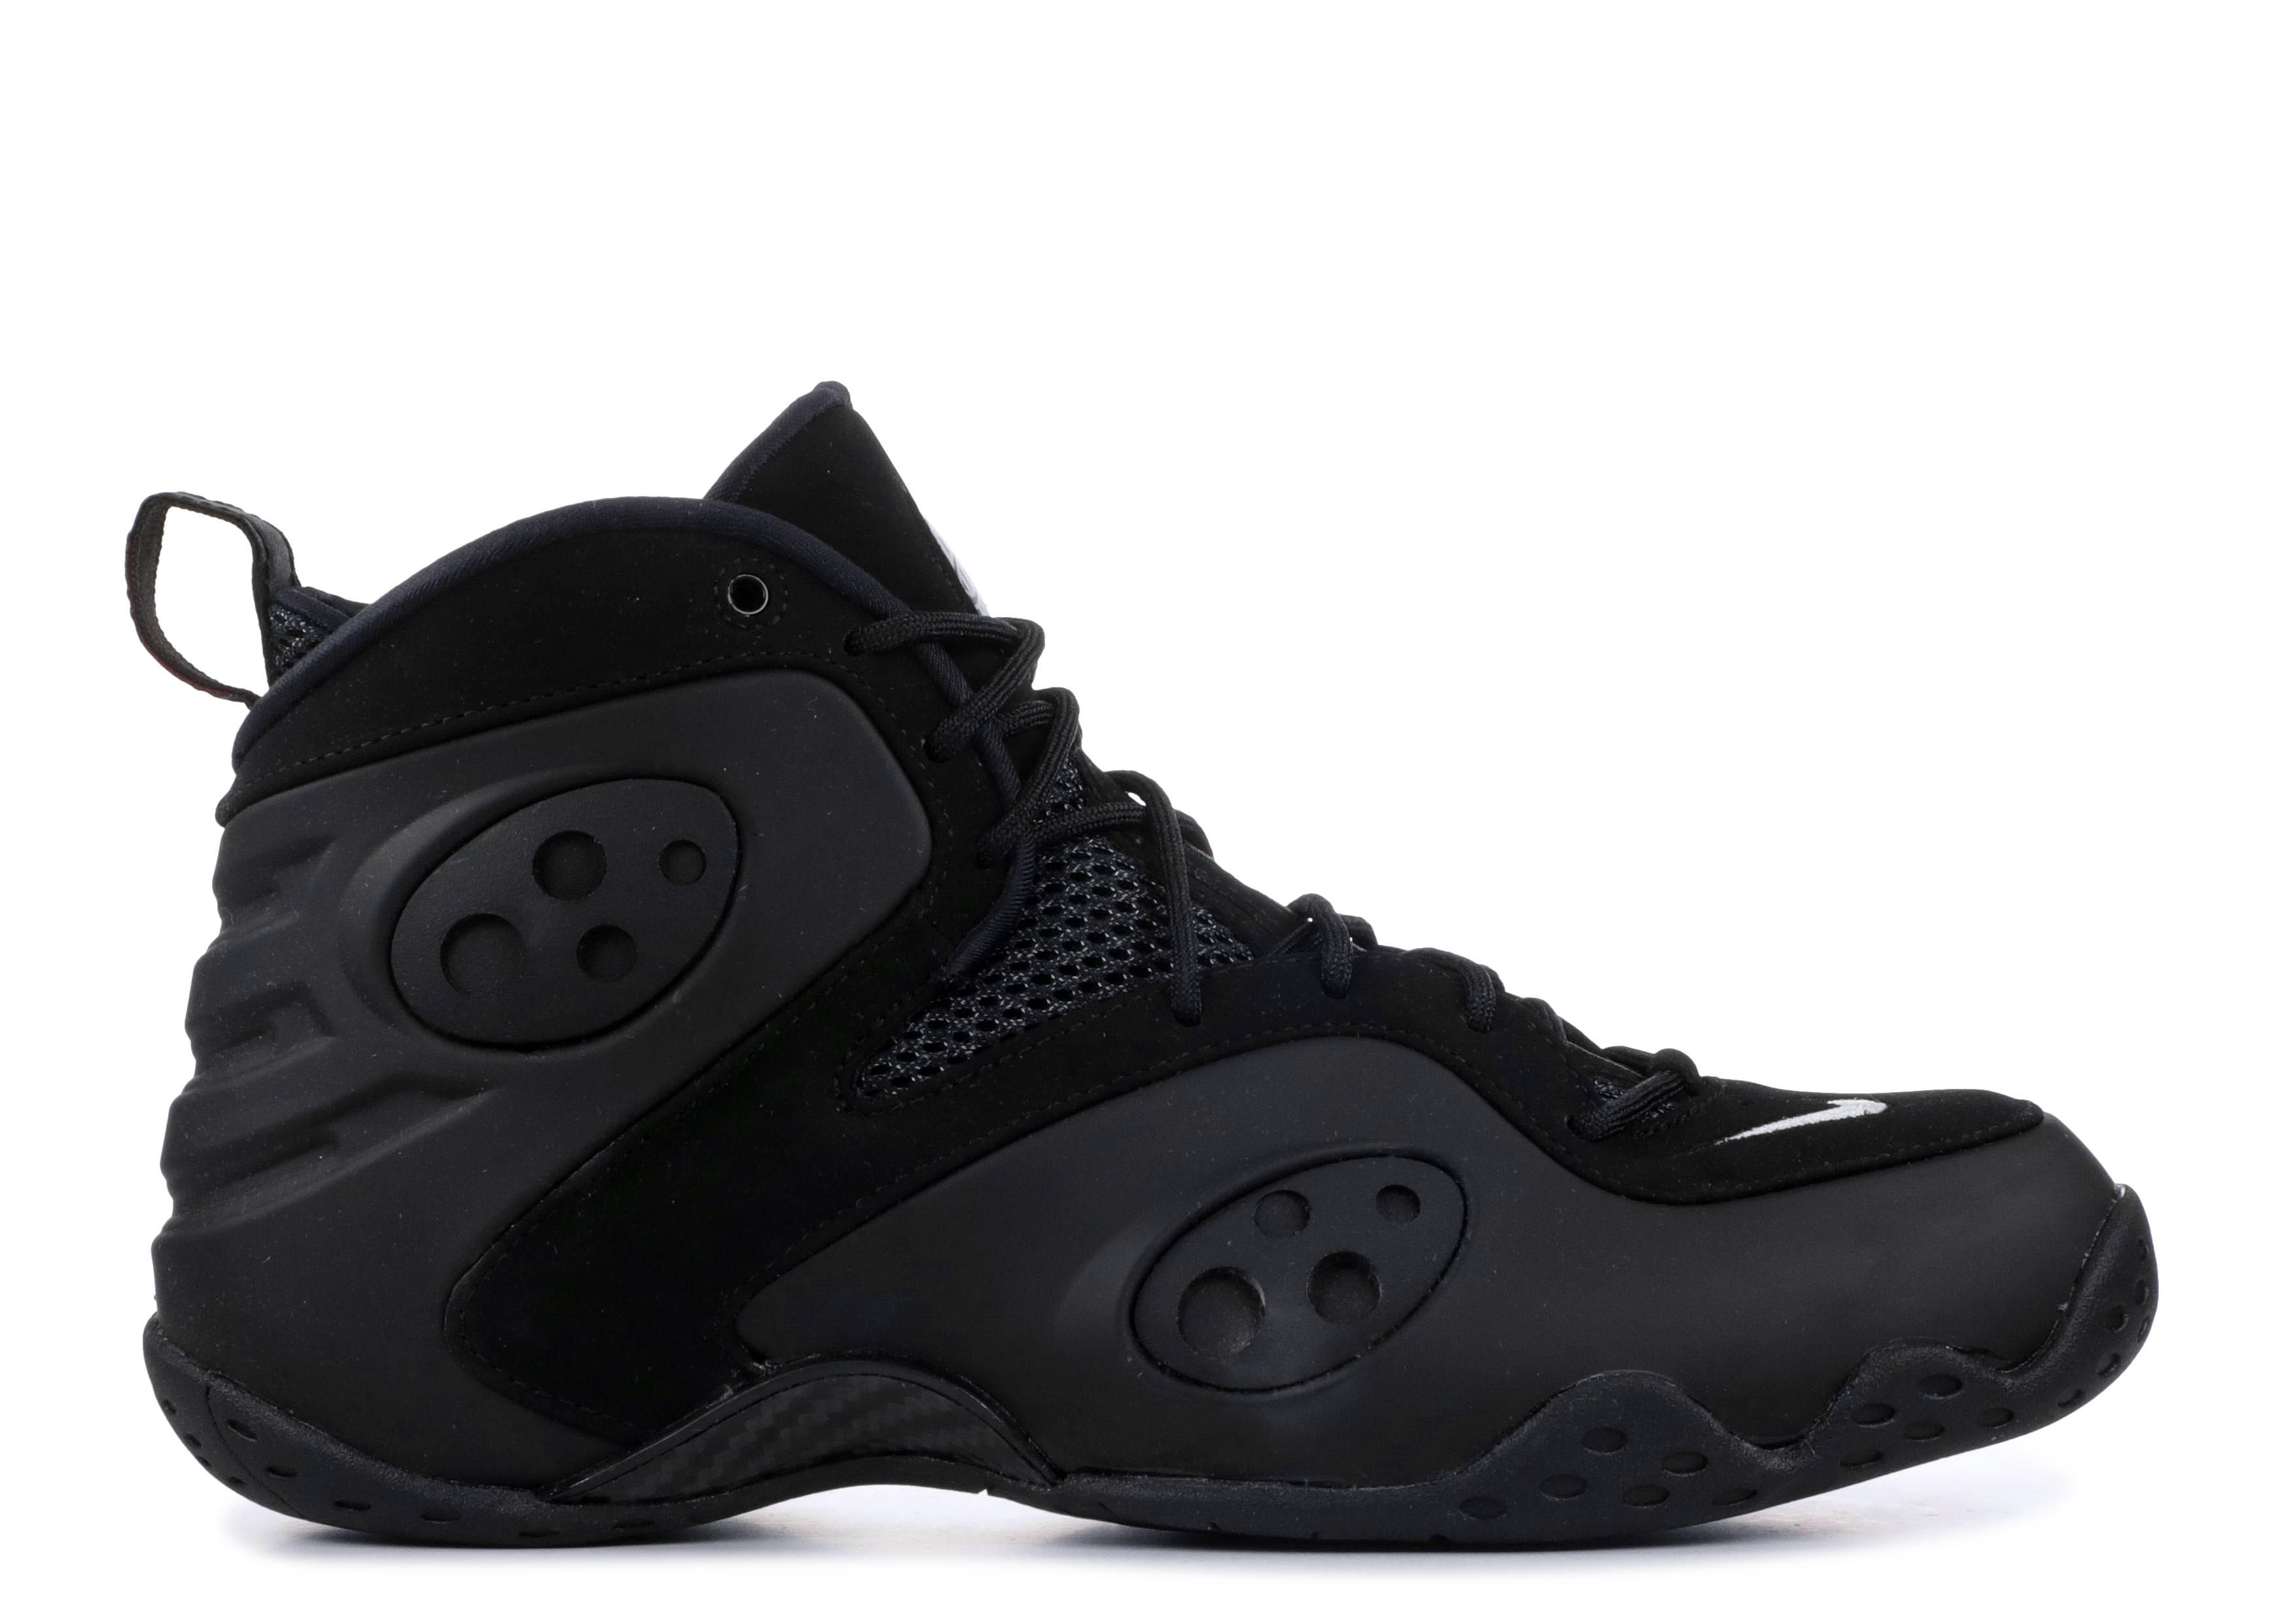 711877cd0fdb4 Penny Hardaway - Nike Basketball - Nike